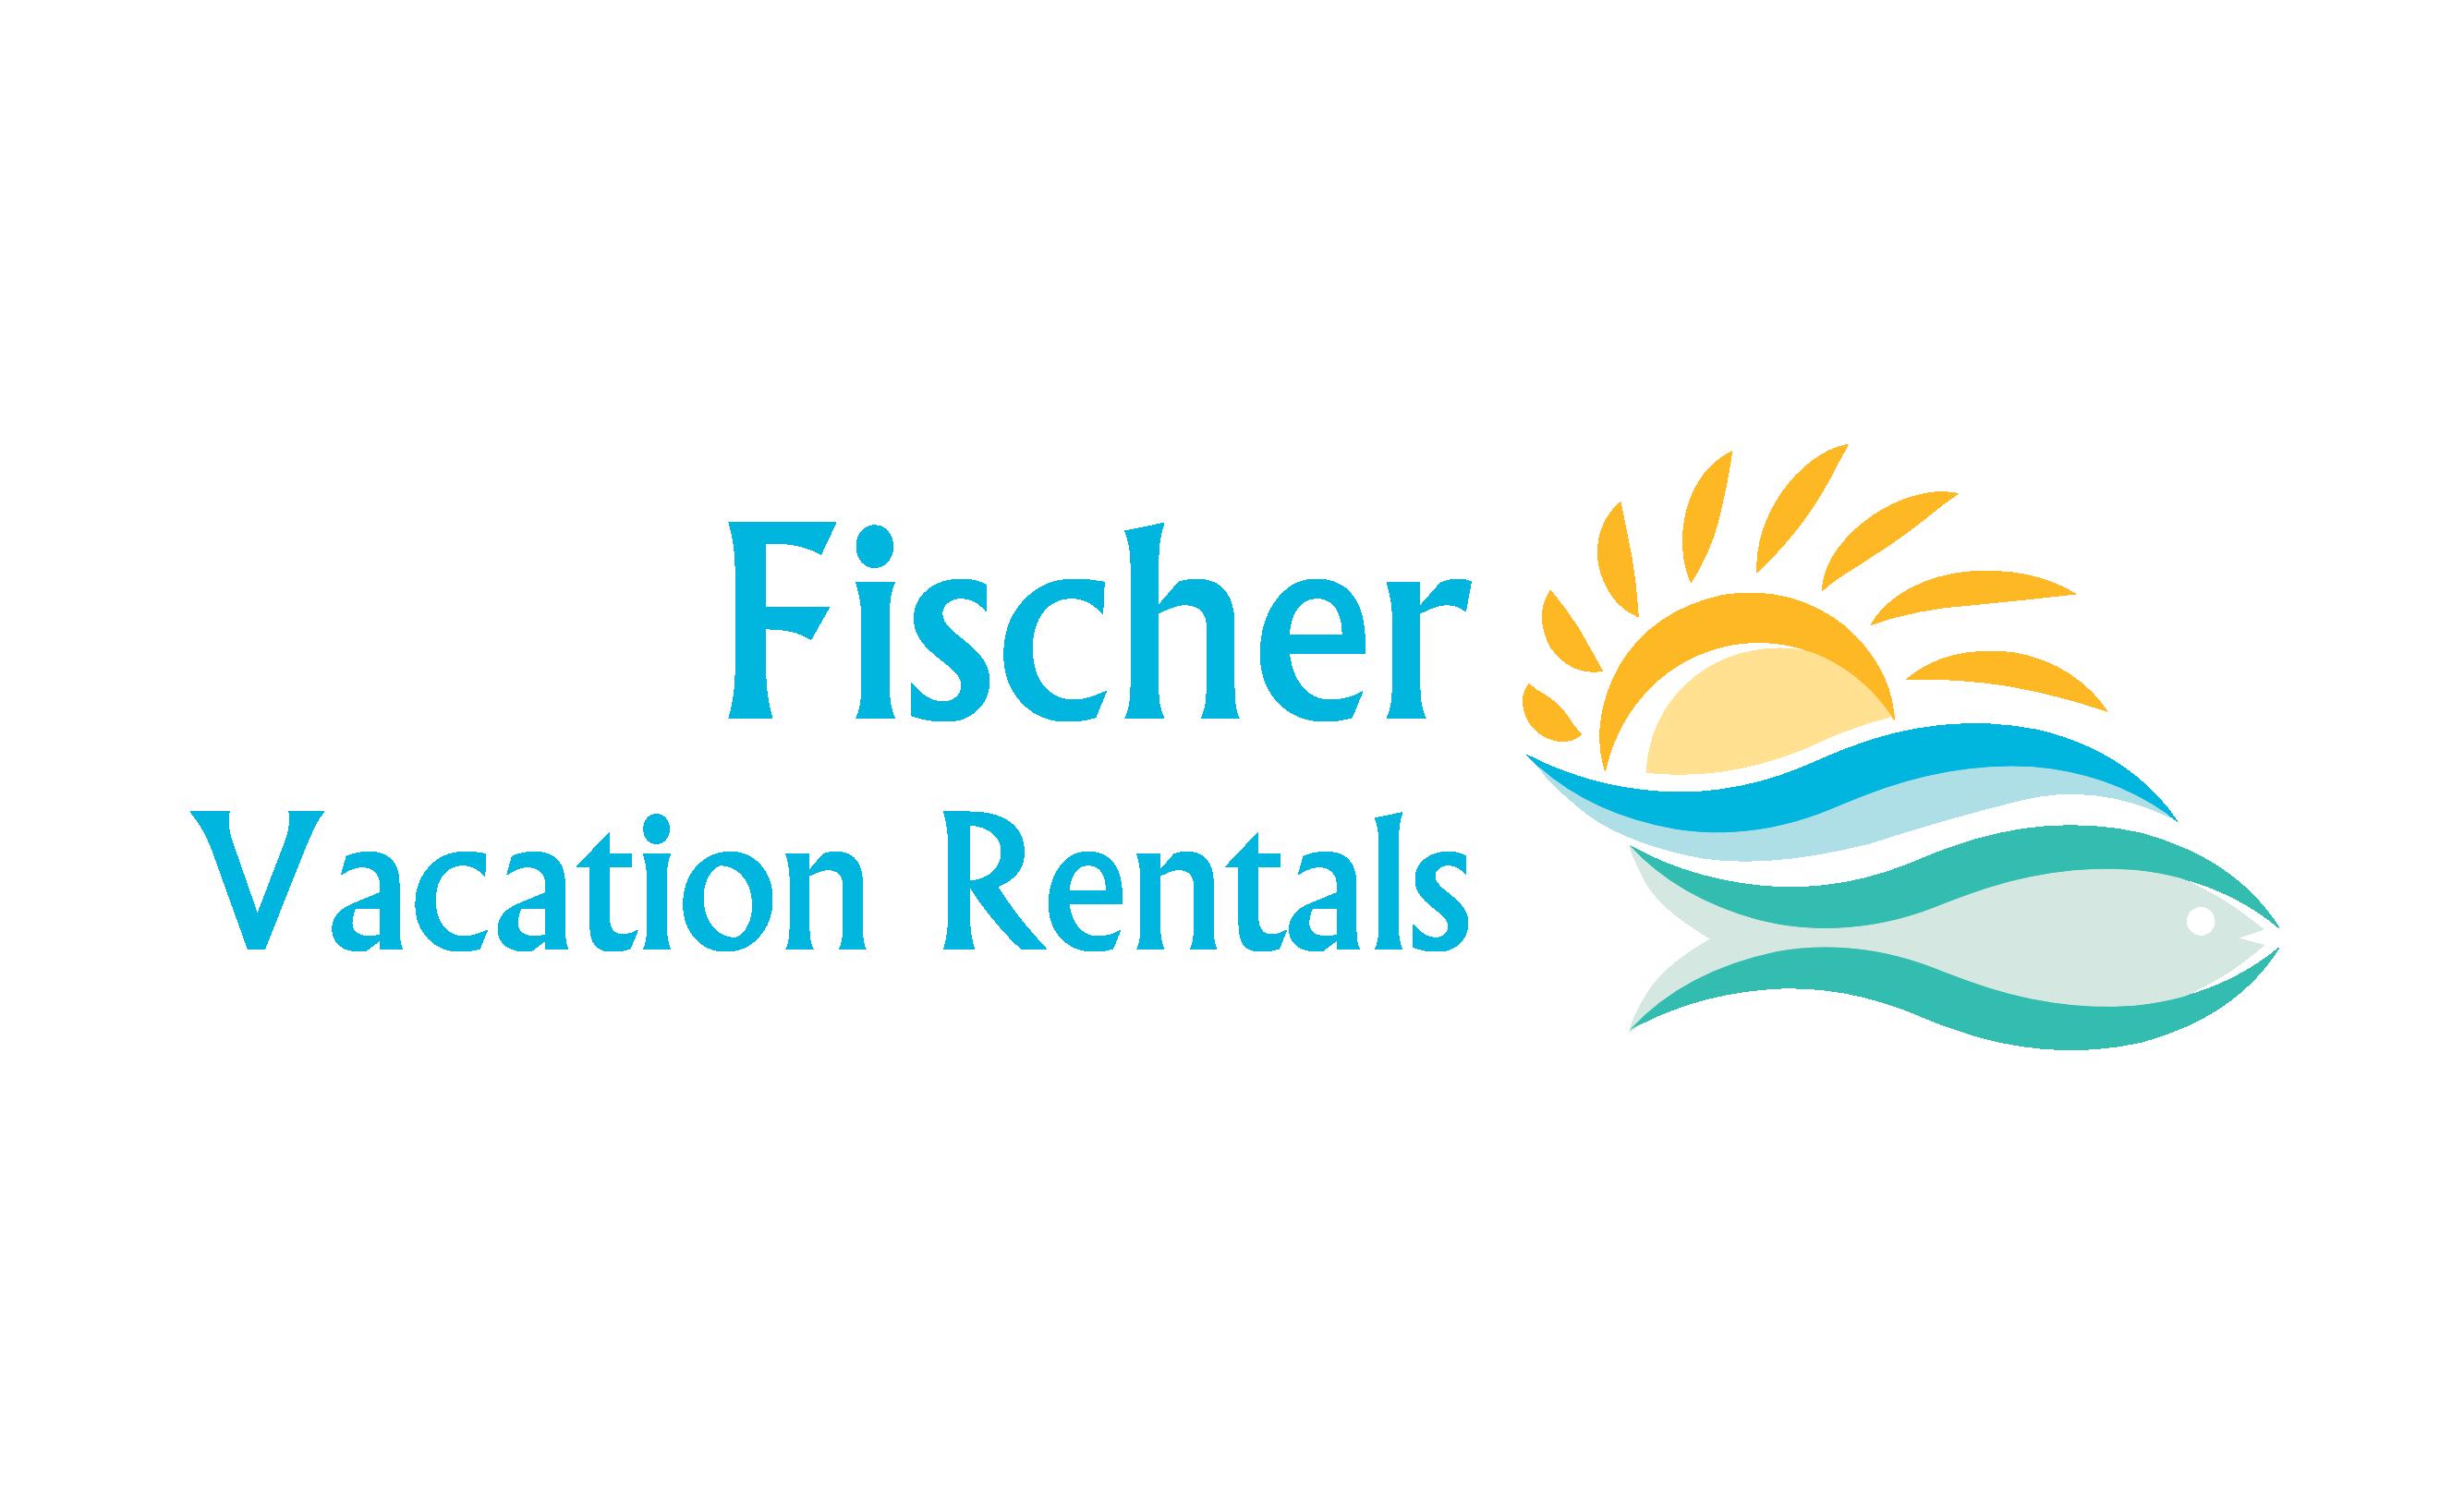 Fischer Vacation Rentals